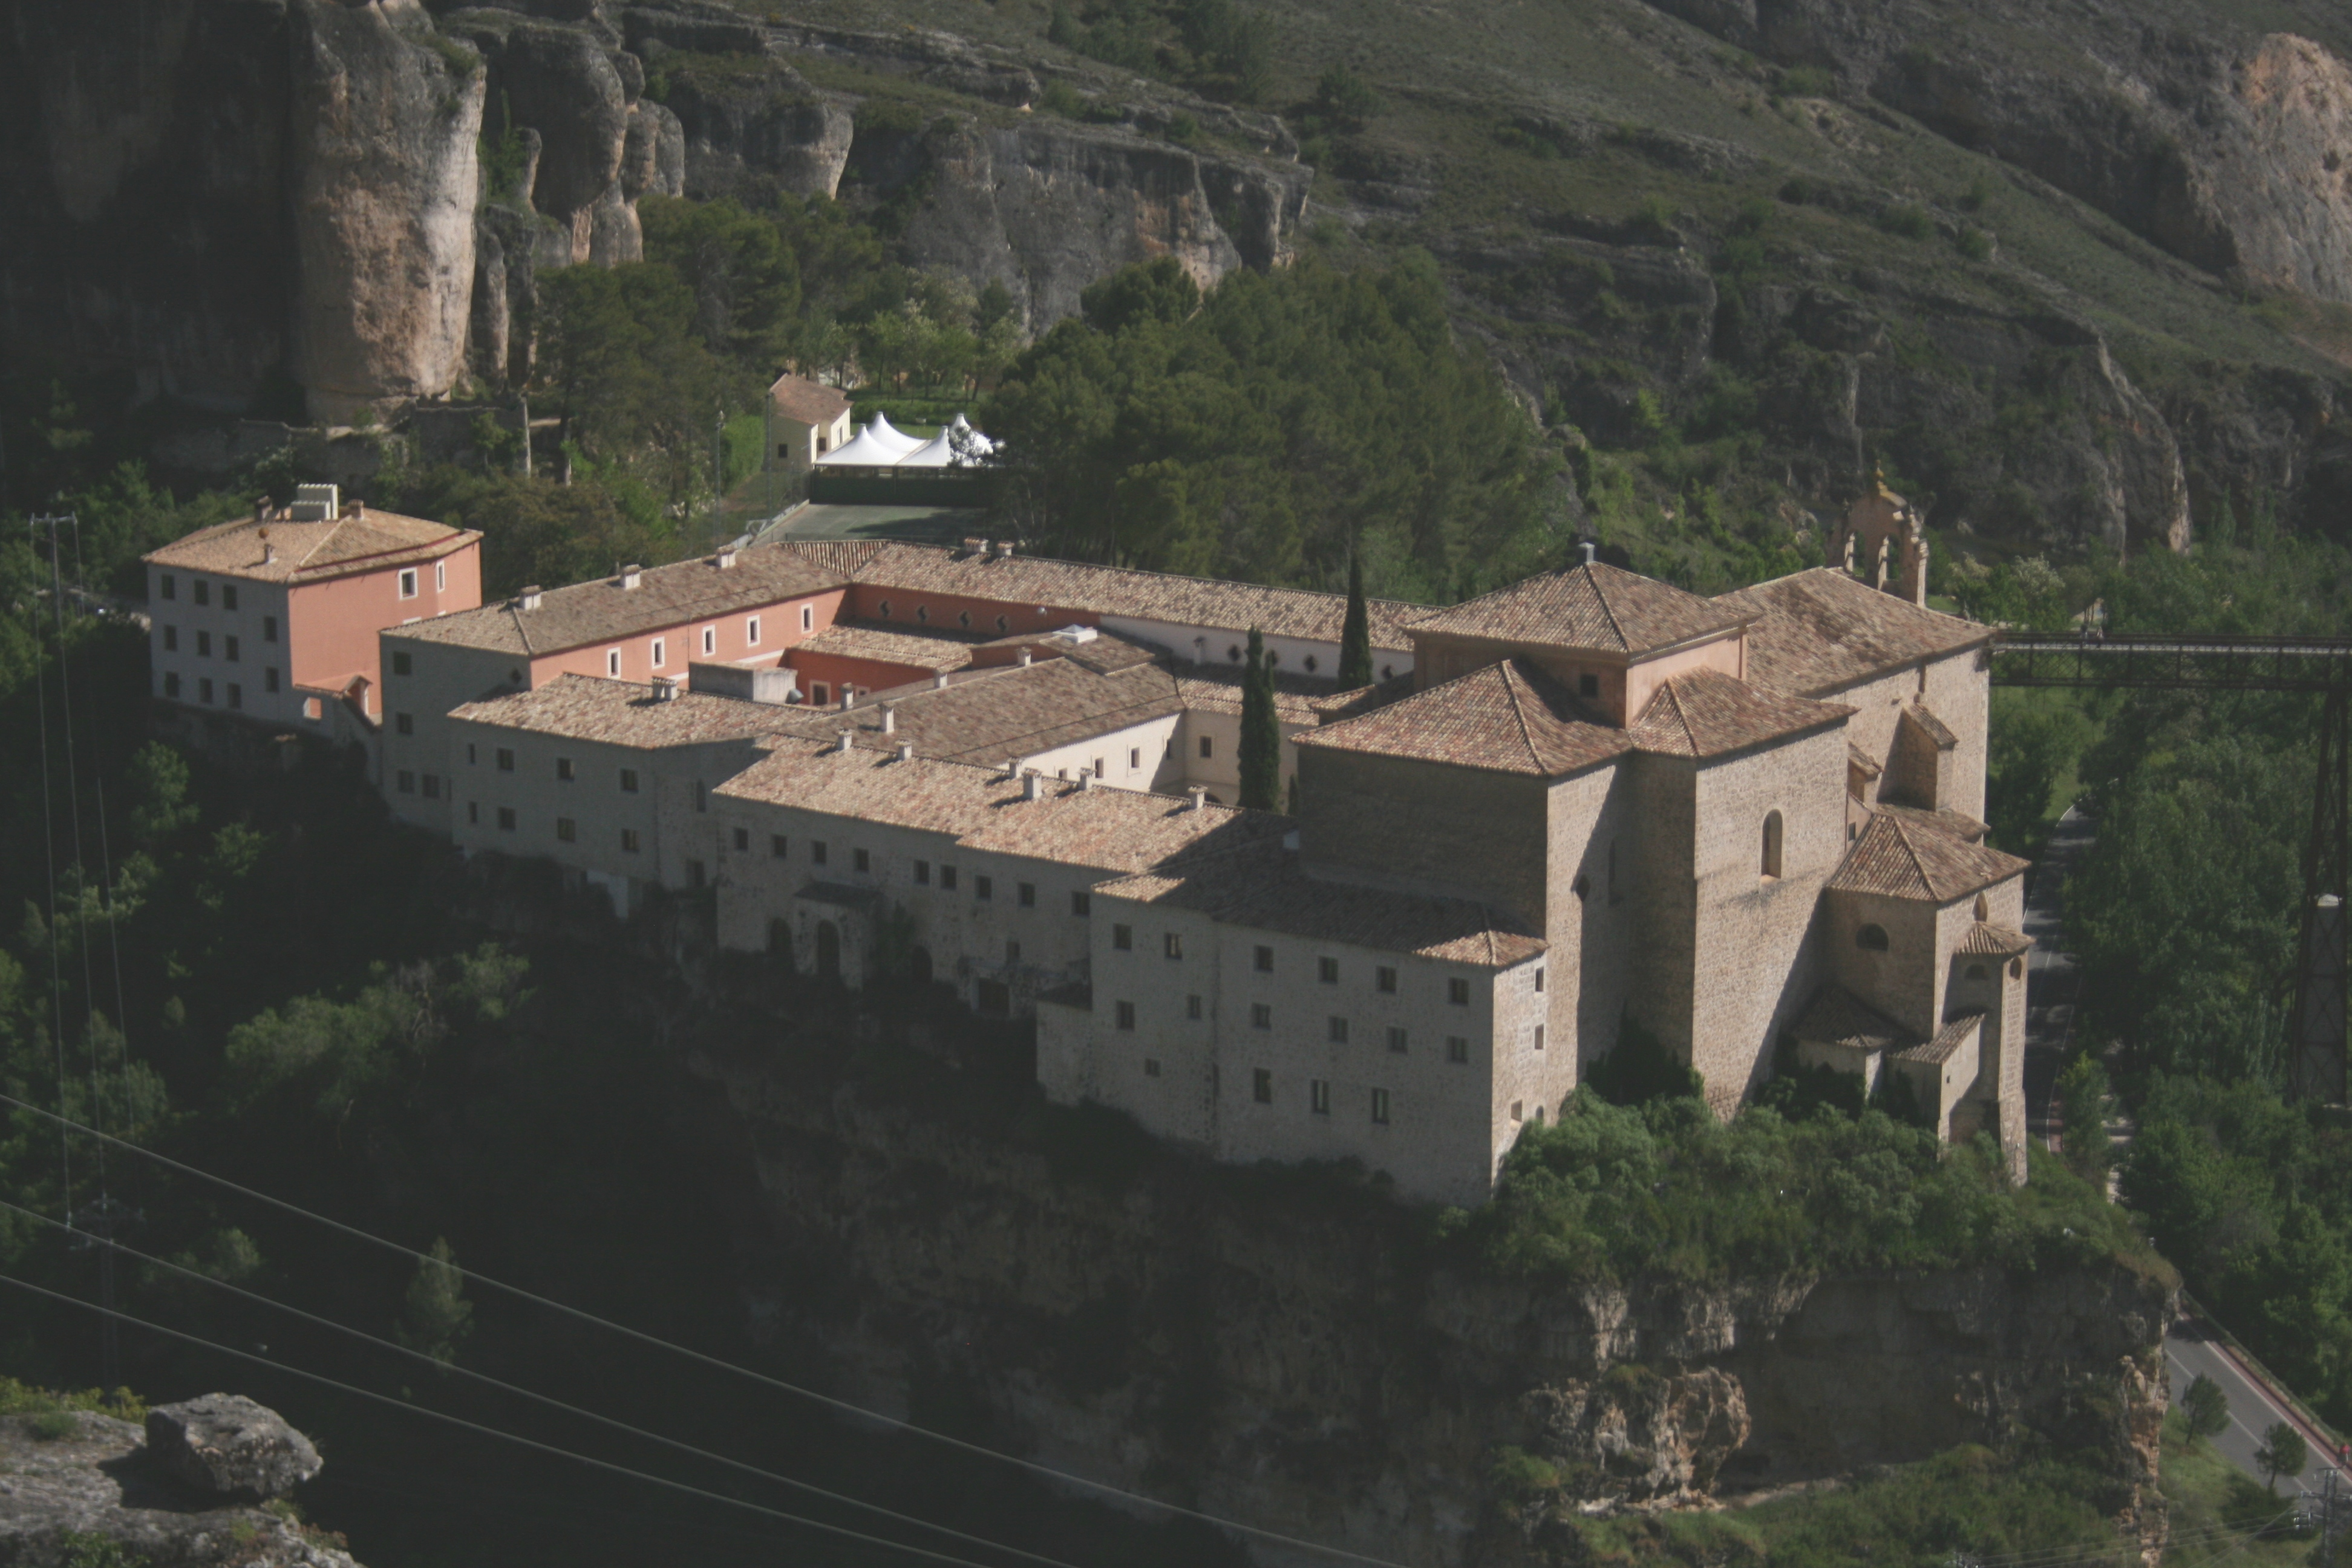 File:Parador Nacional Cuenca 073.jpg - Wikimedia Commons